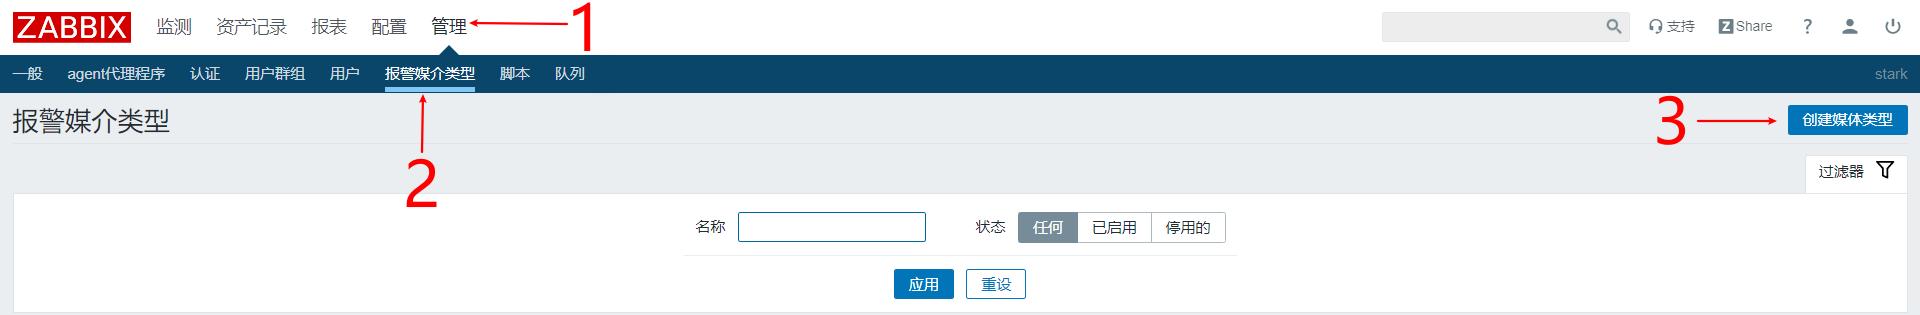 zabbix发送告警到telegram群组